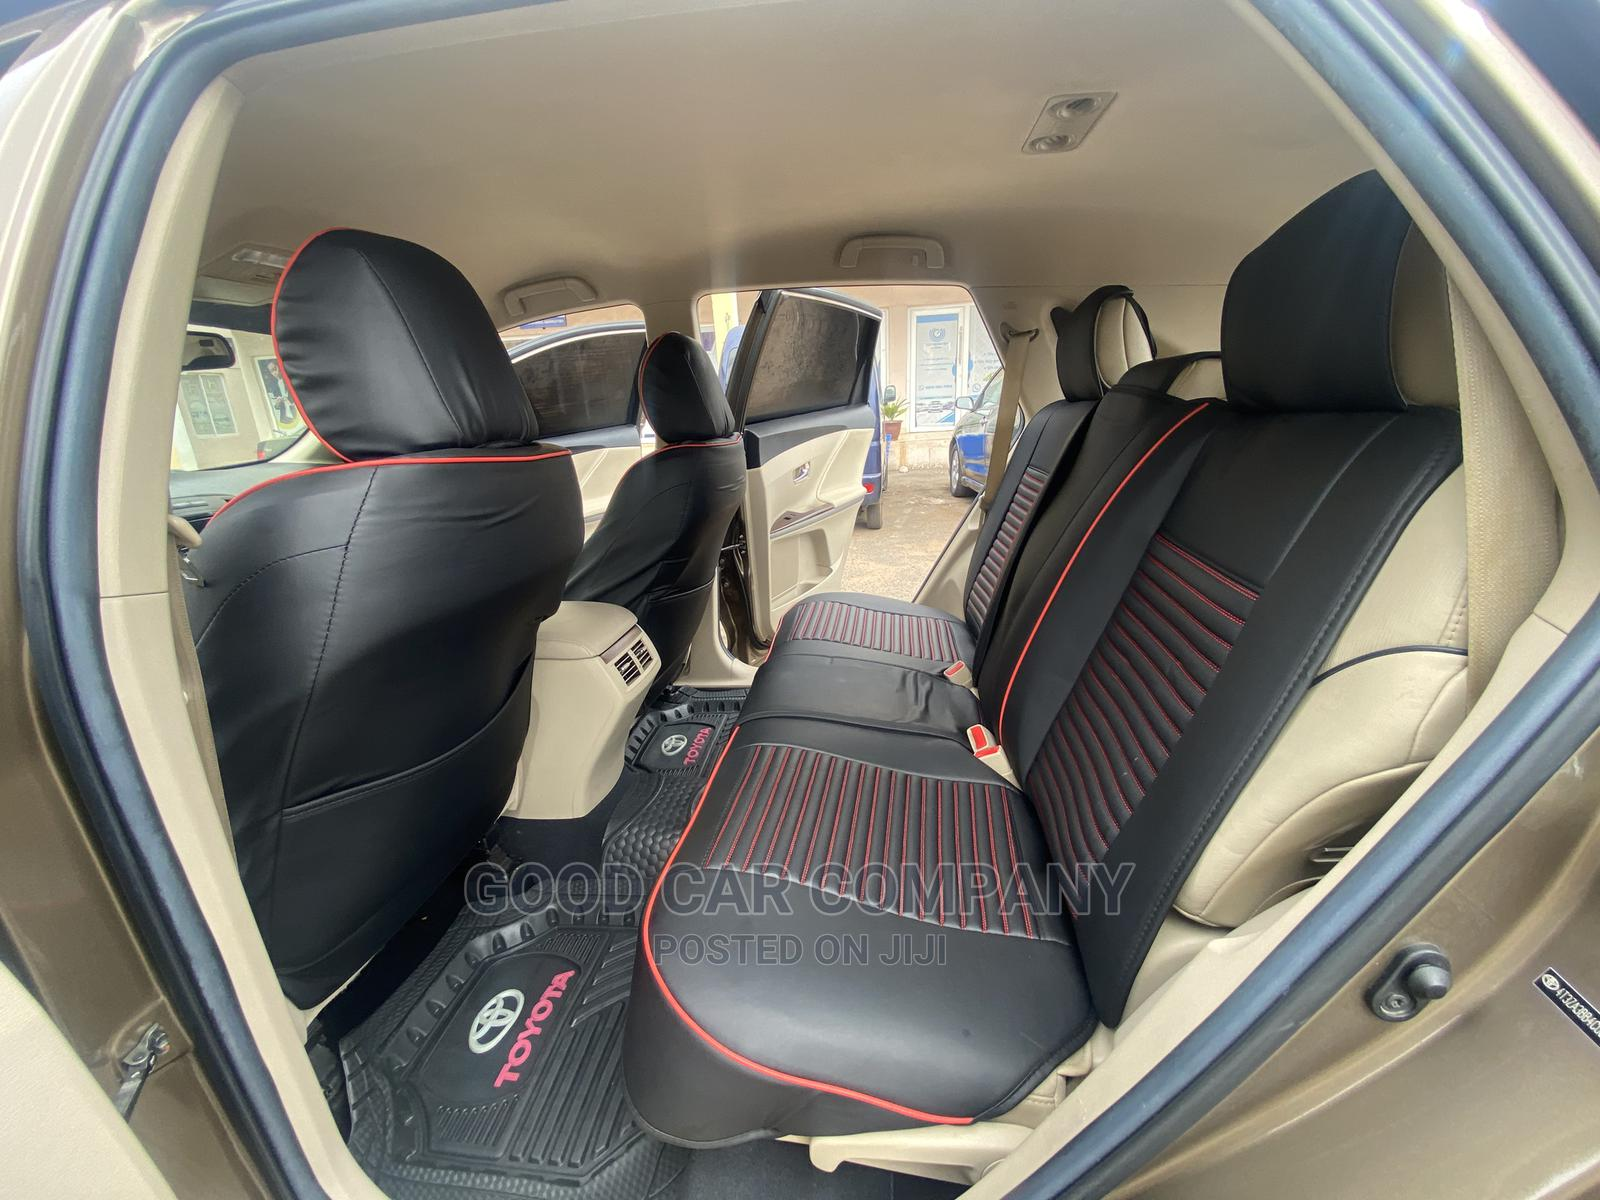 Toyota Venza 2012 Brown | Cars for sale in Ilorin South, Kwara State, Nigeria